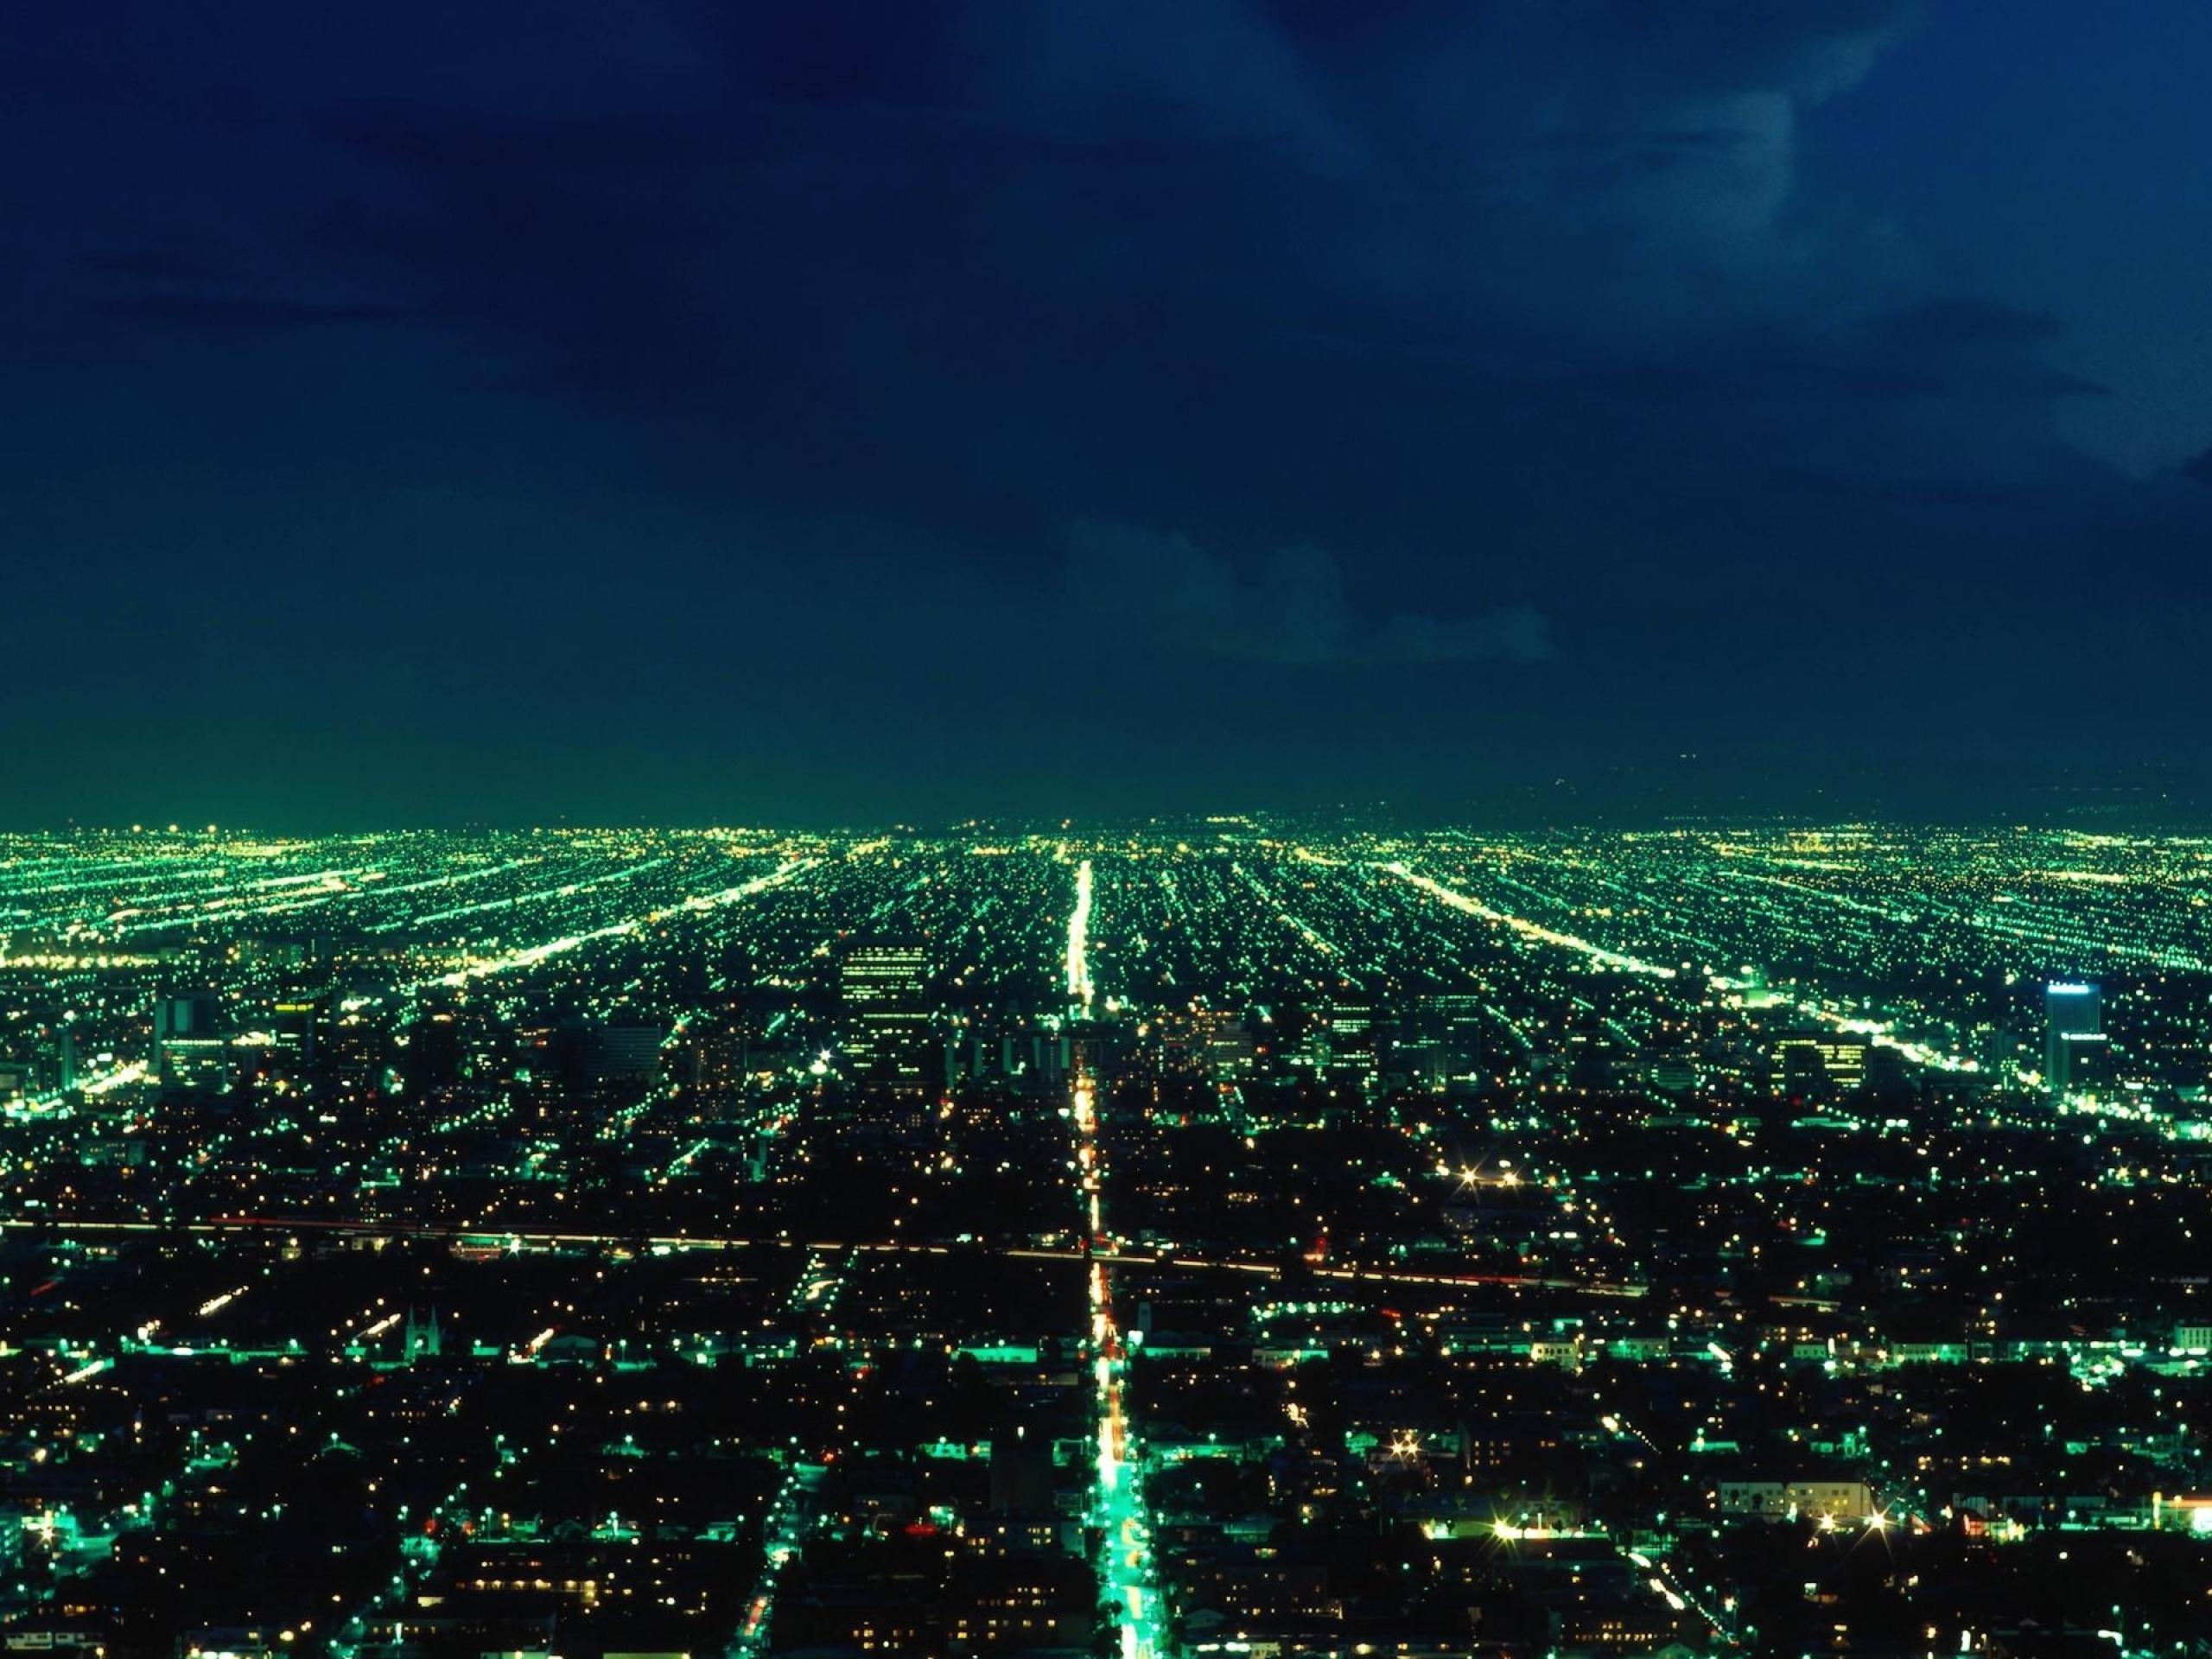 City Skyline at Night wallpapers City Skyline at Night stock photos 2560x1920